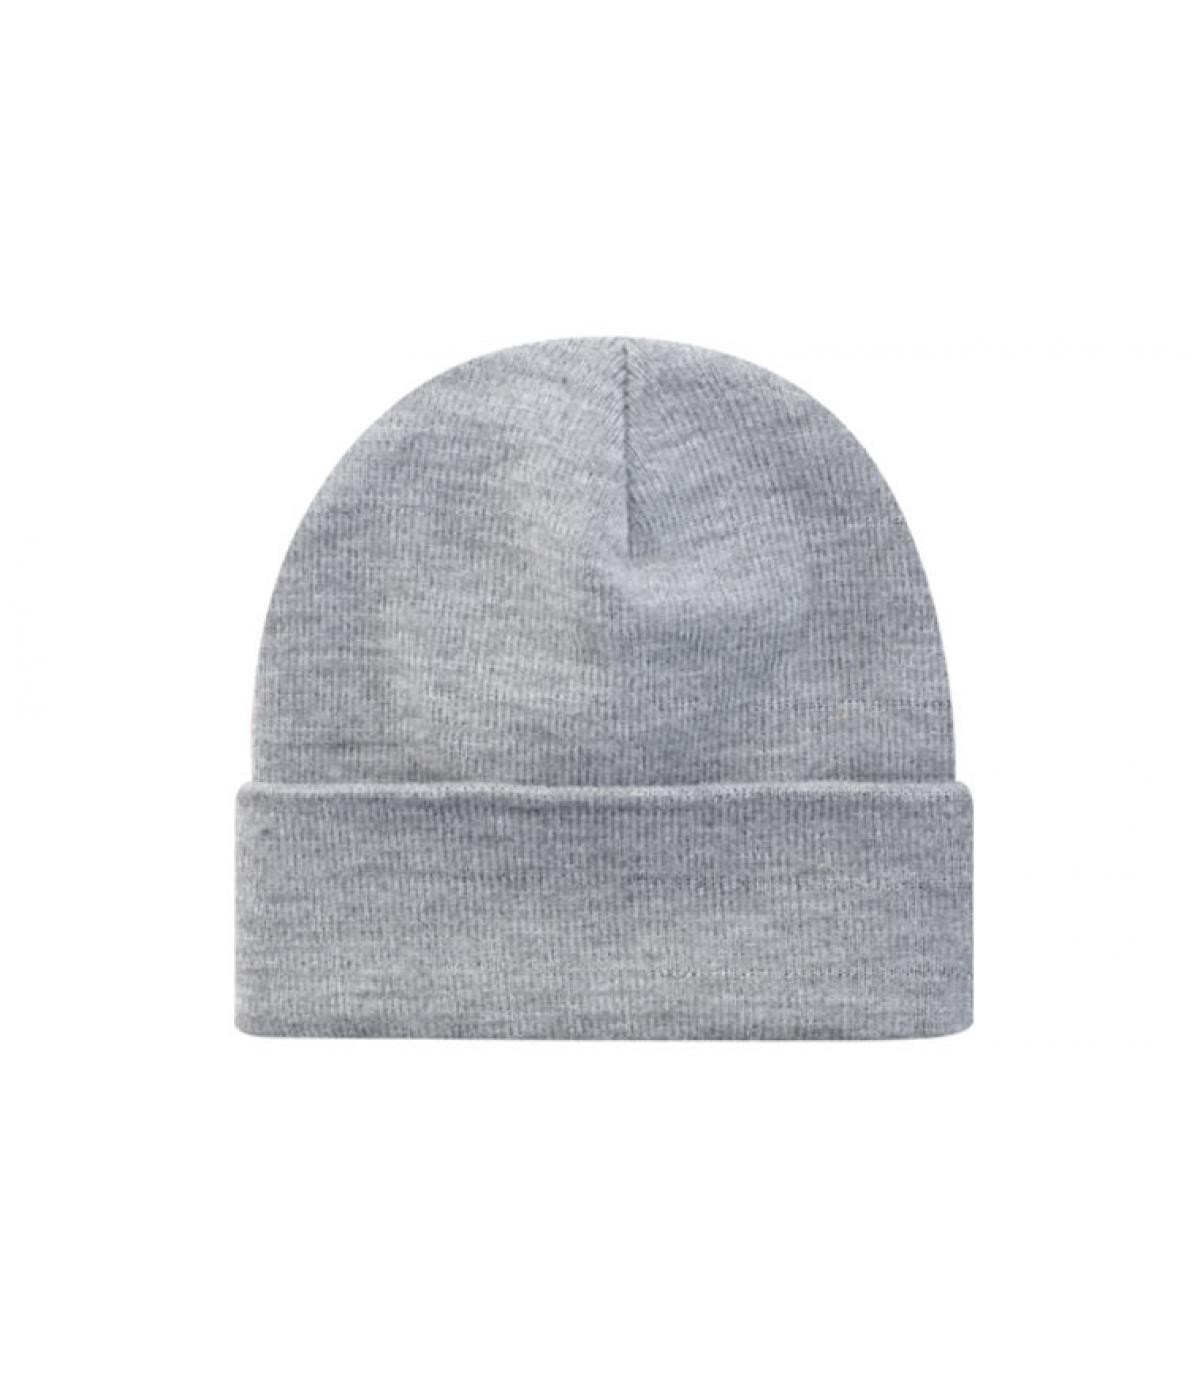 Beanie blank grey